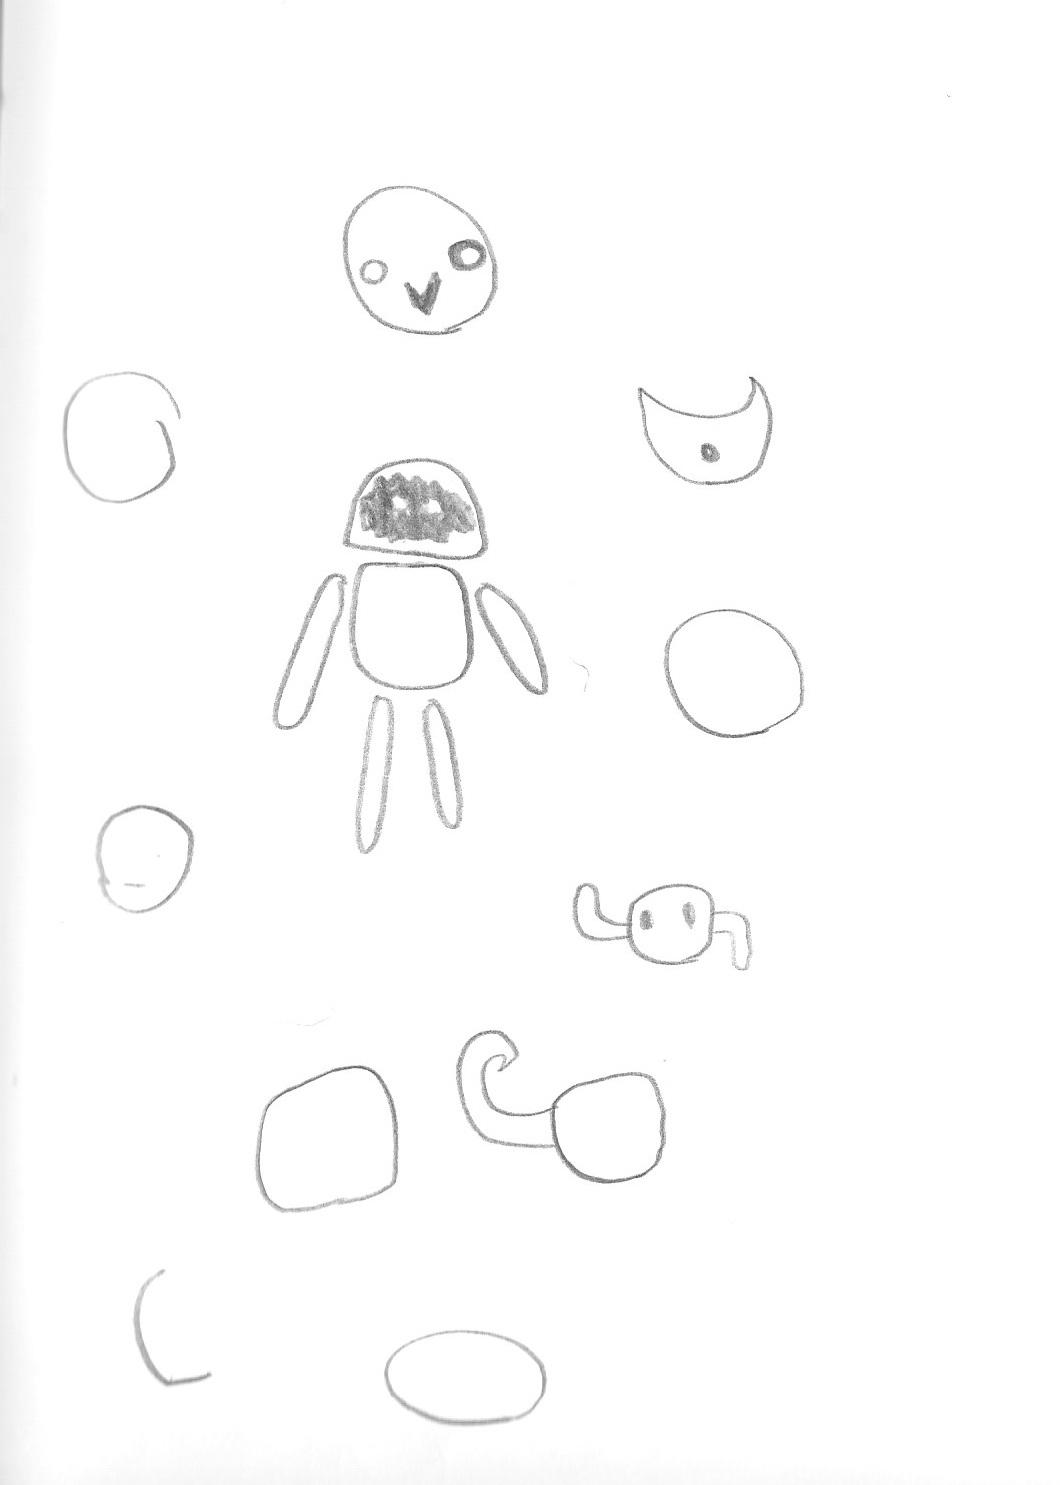 Characters-Various-Characters.png